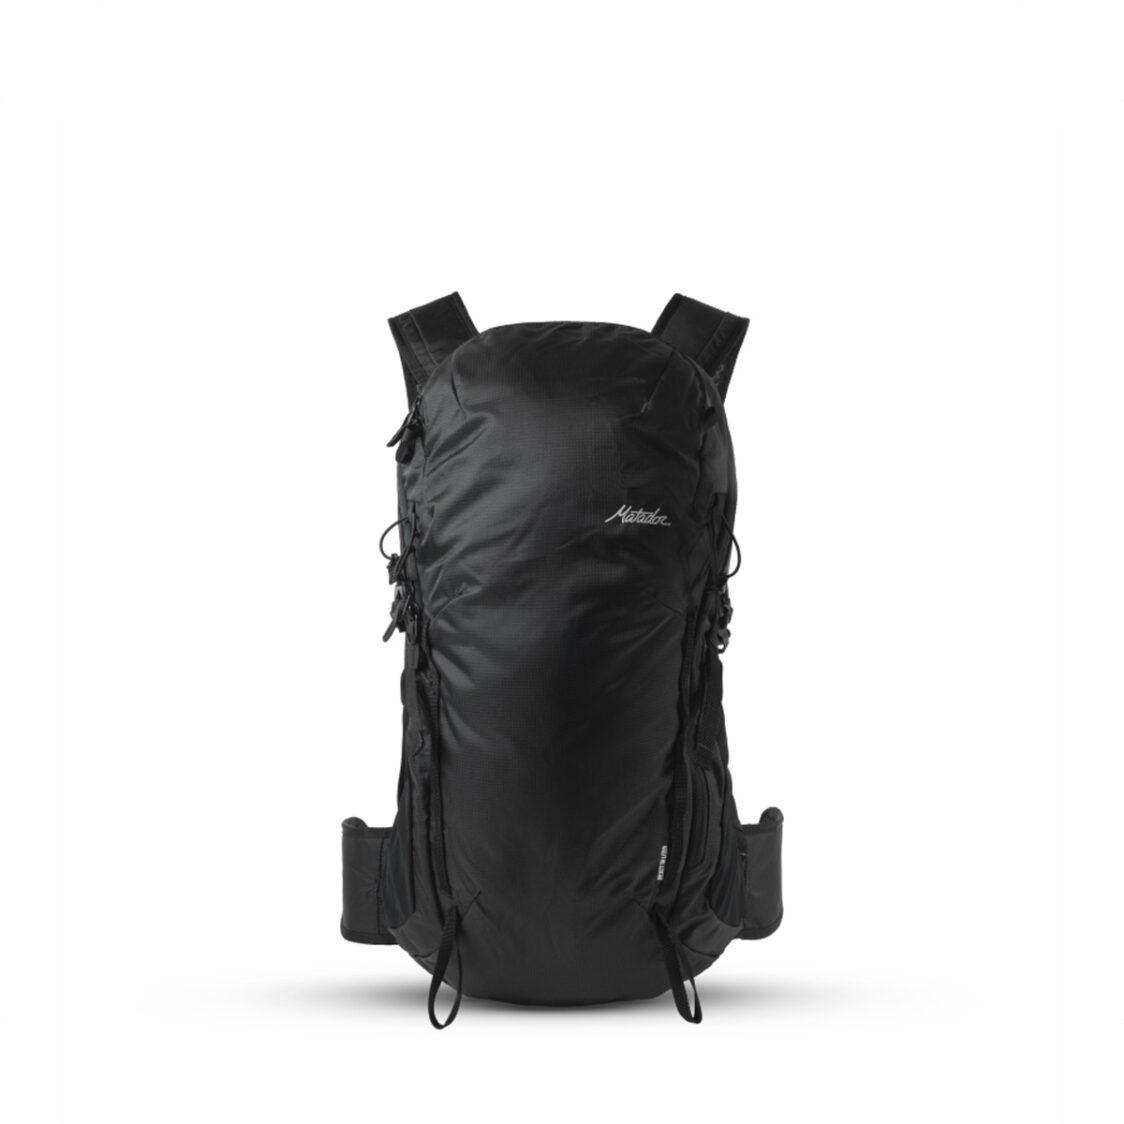 Matador Beast18 20 Backpack Charcoal MA-MATBE18001BK